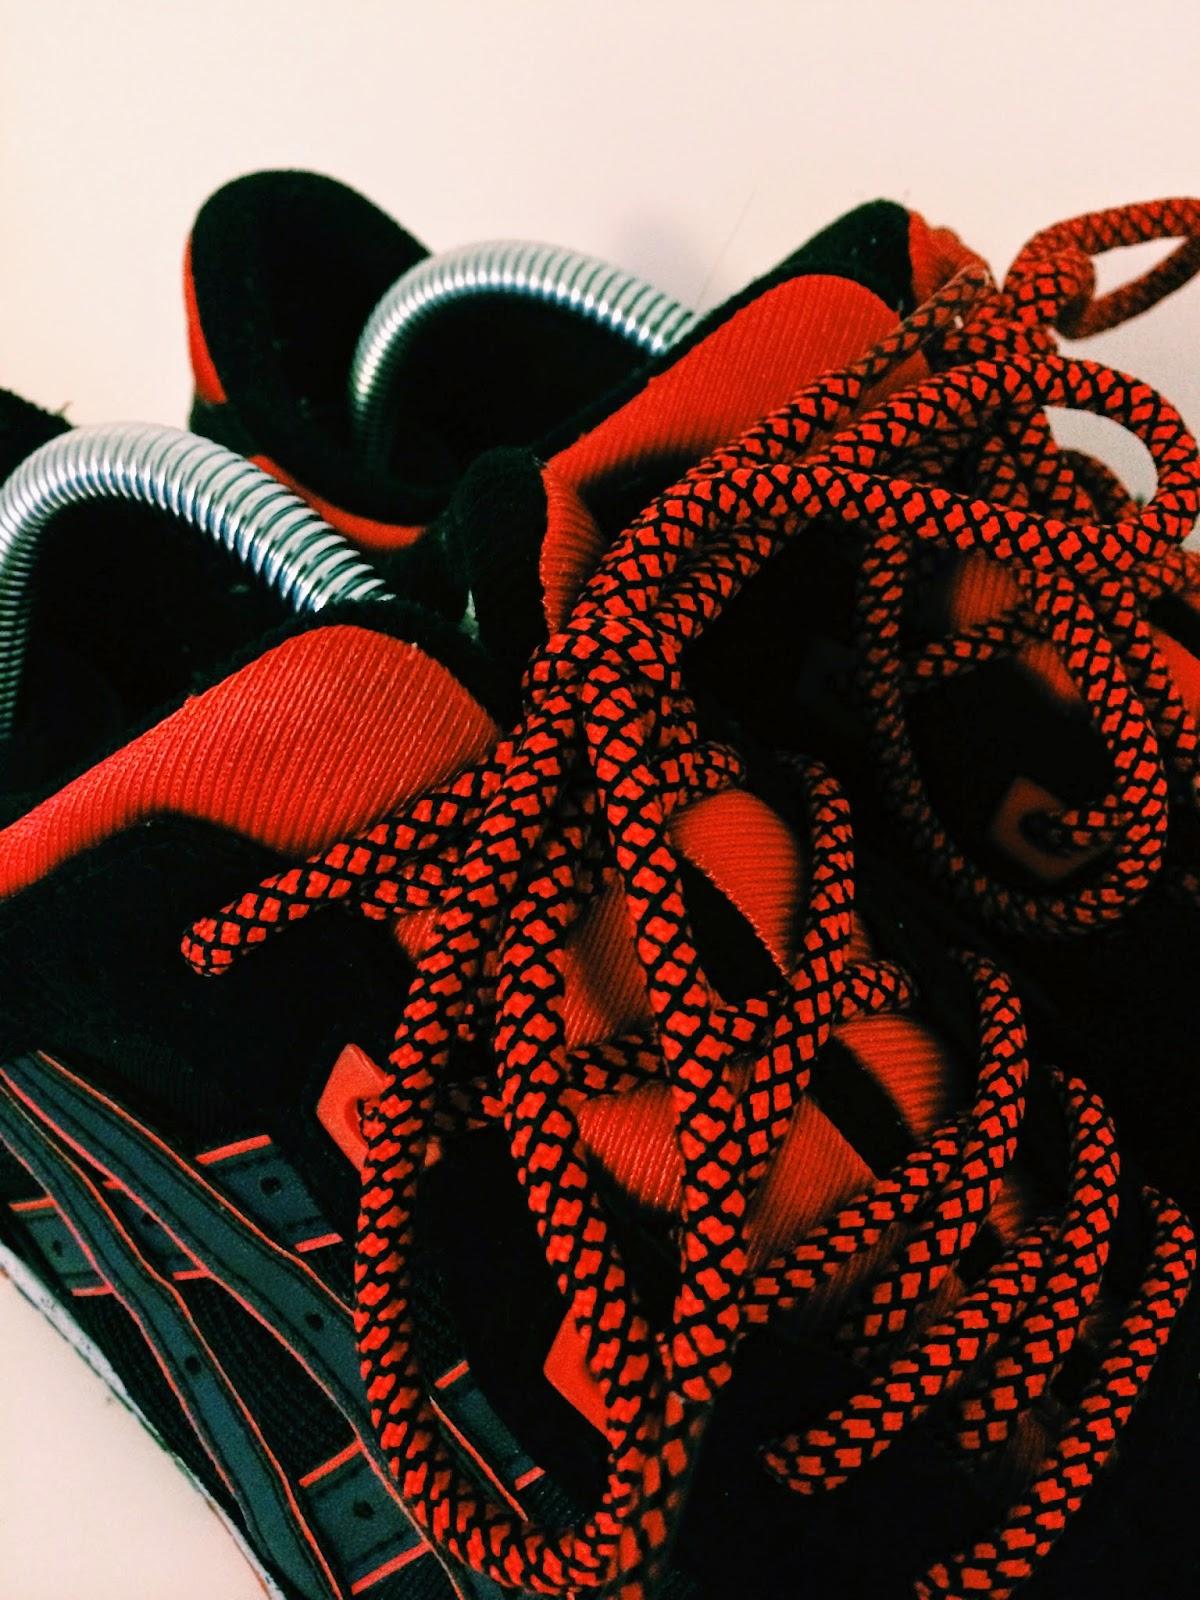 ropes laces custom laces asics kith caviar gel lyte iii